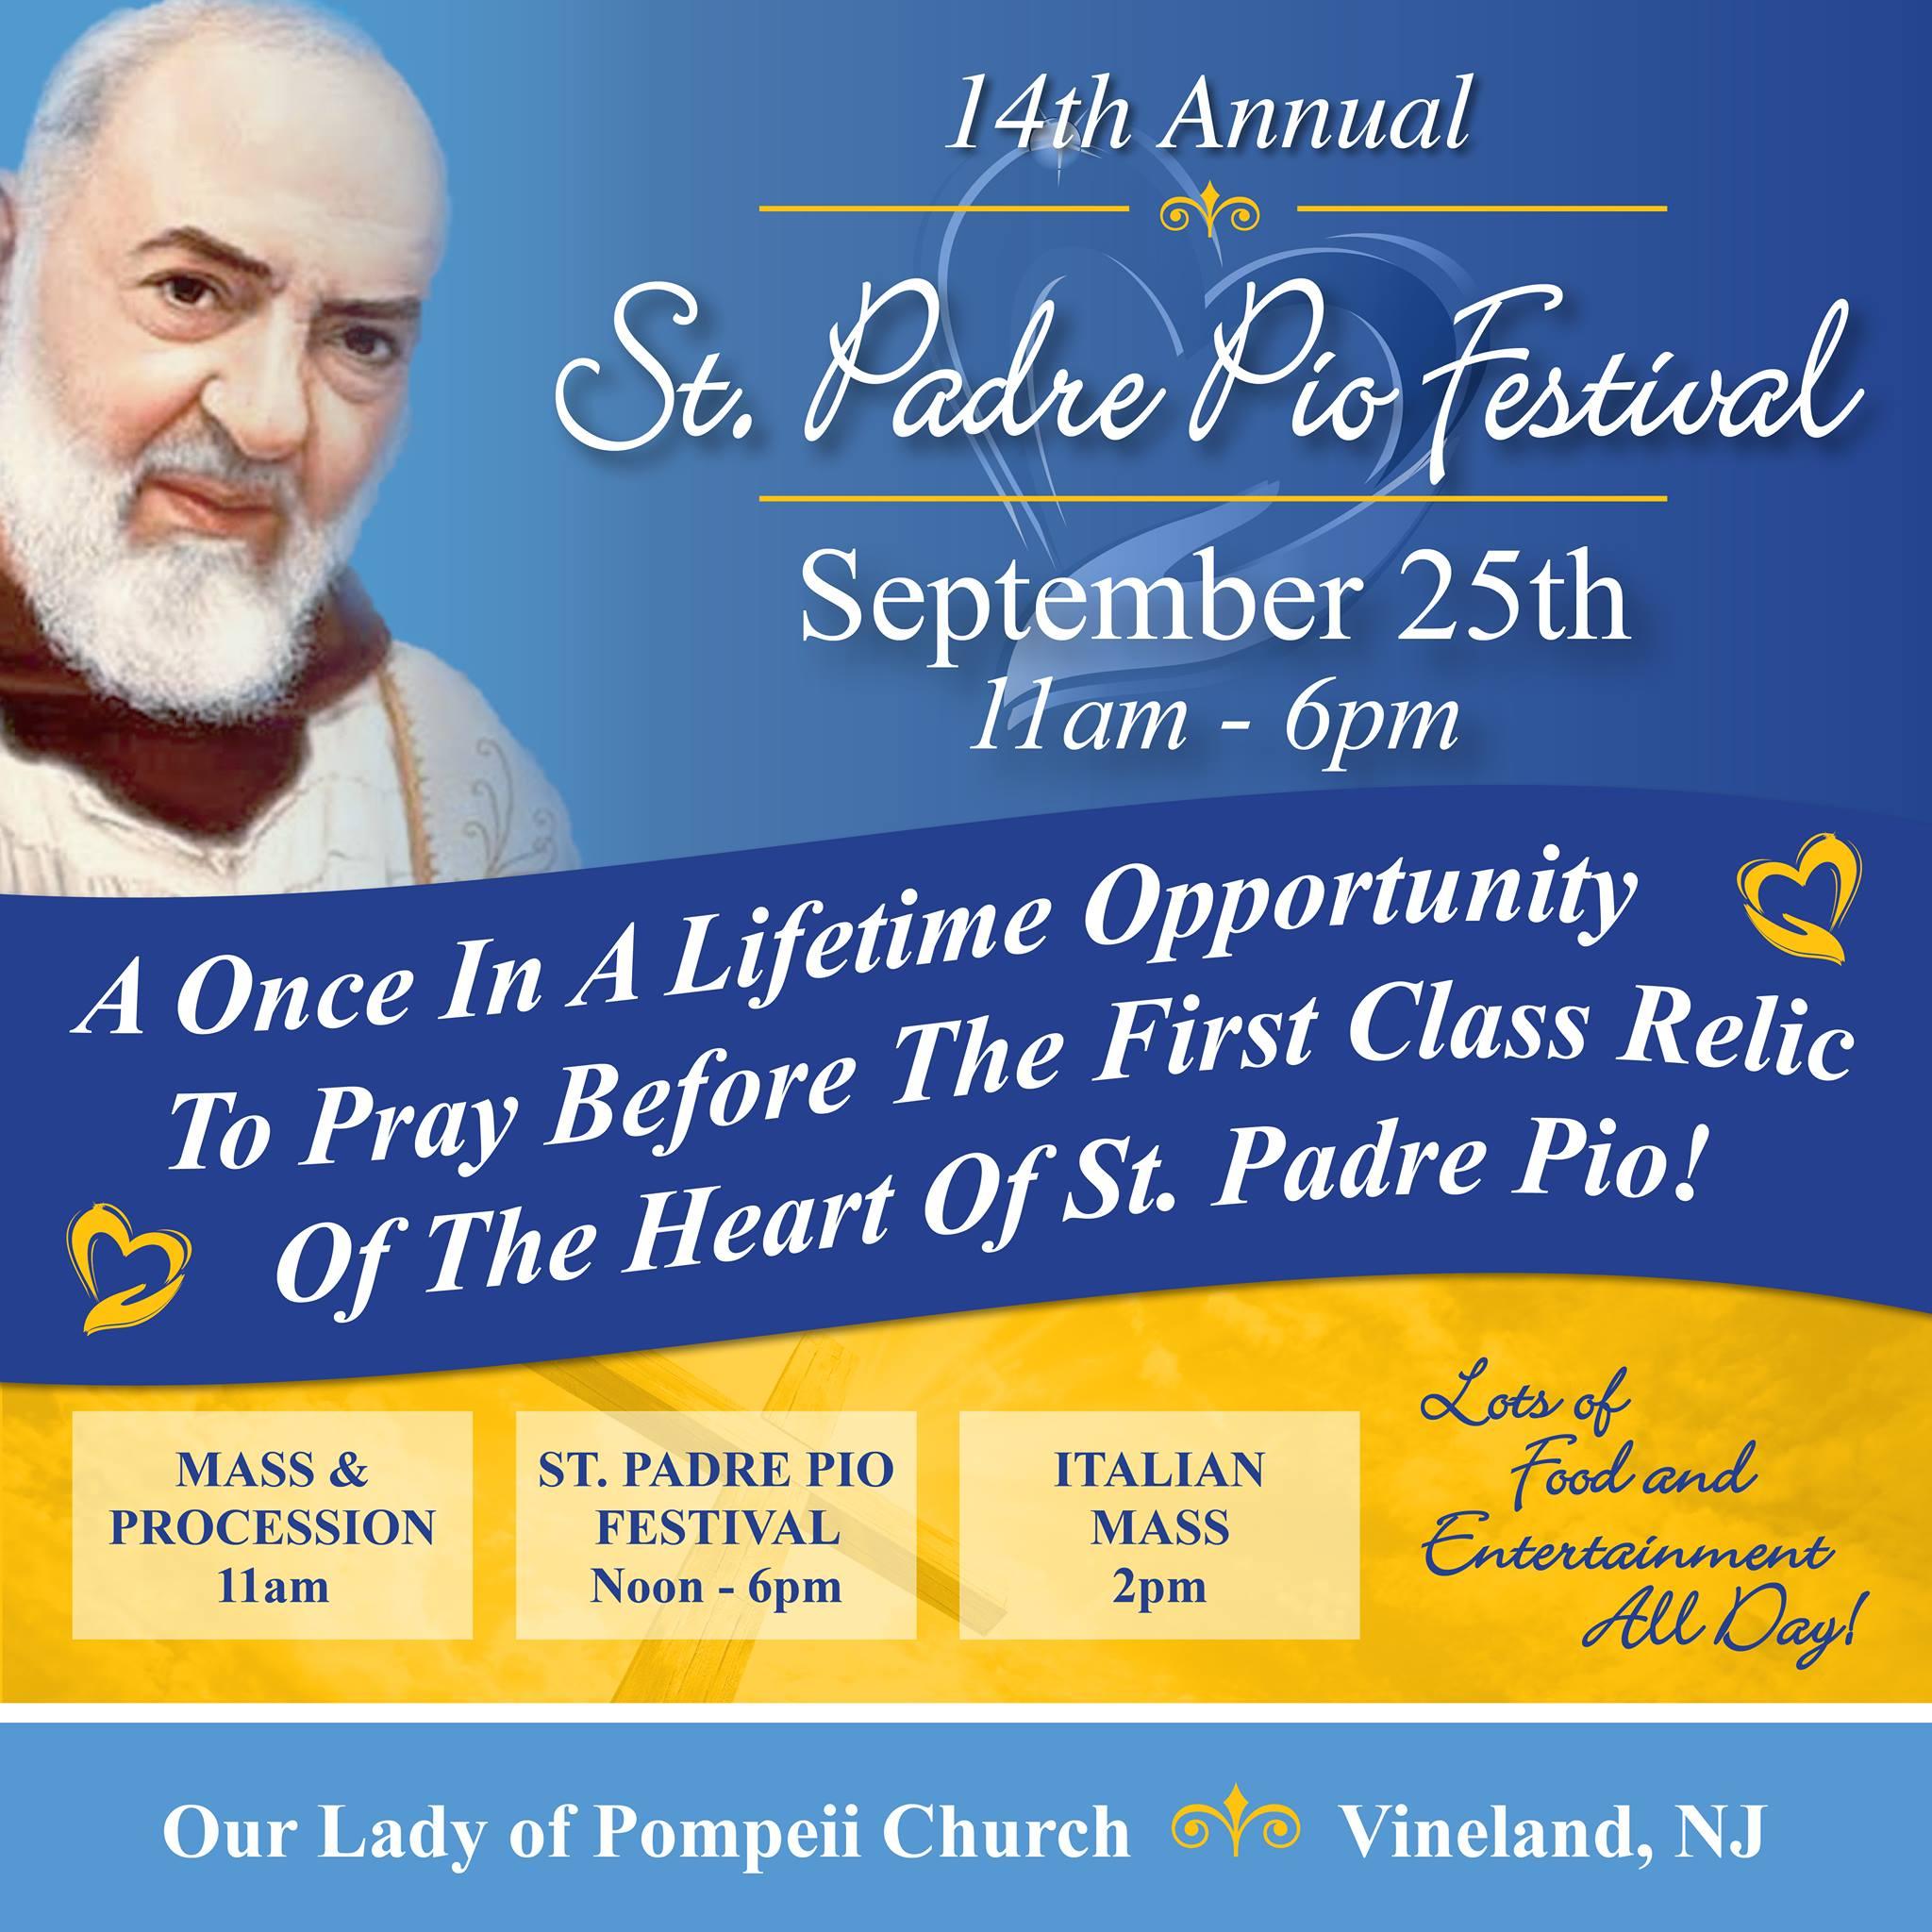 St Padre Pio Festival